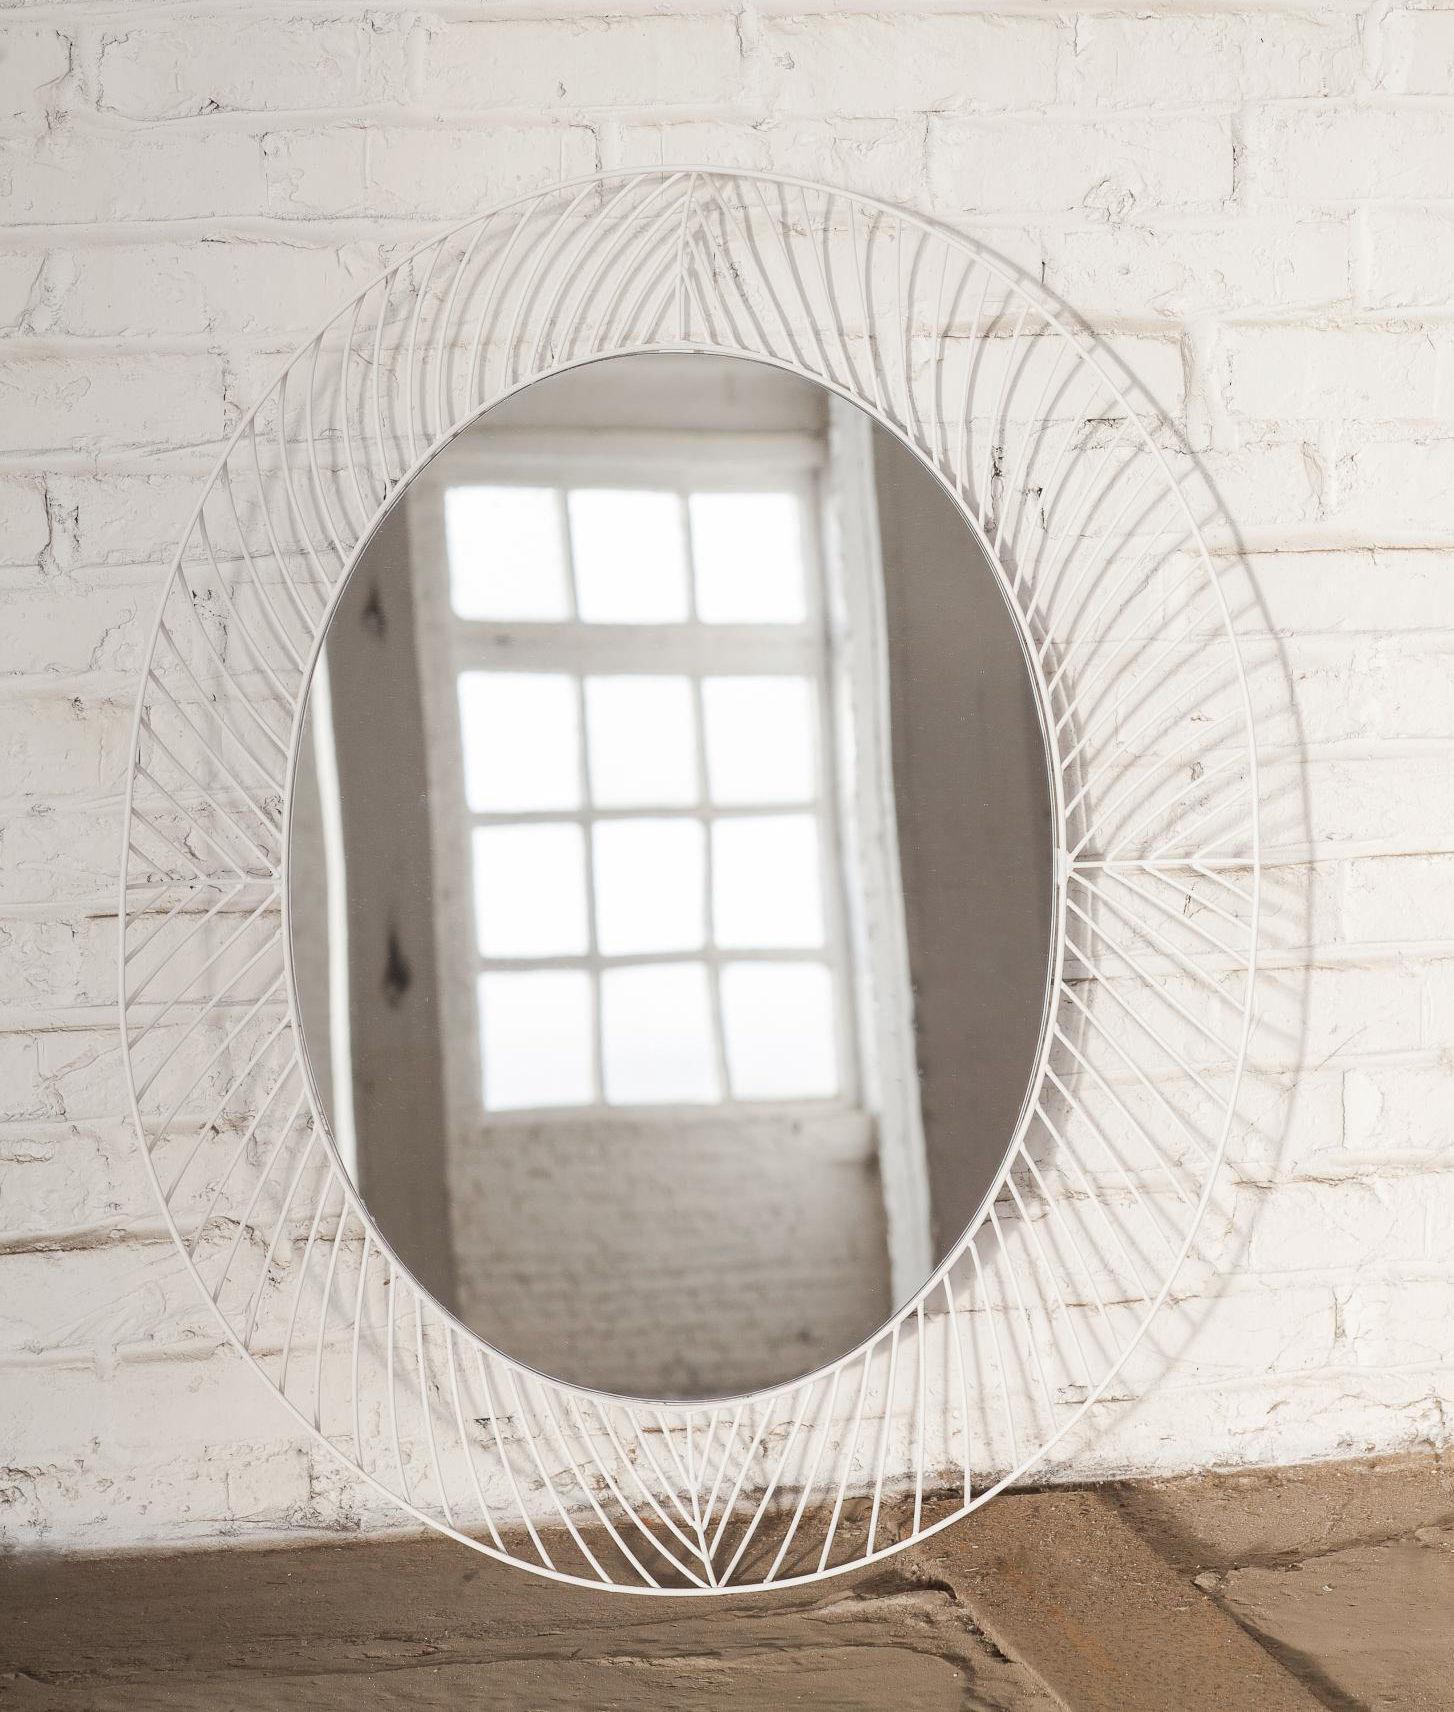 Miroir mural stilk serax blanc made in design for Miroir mural original